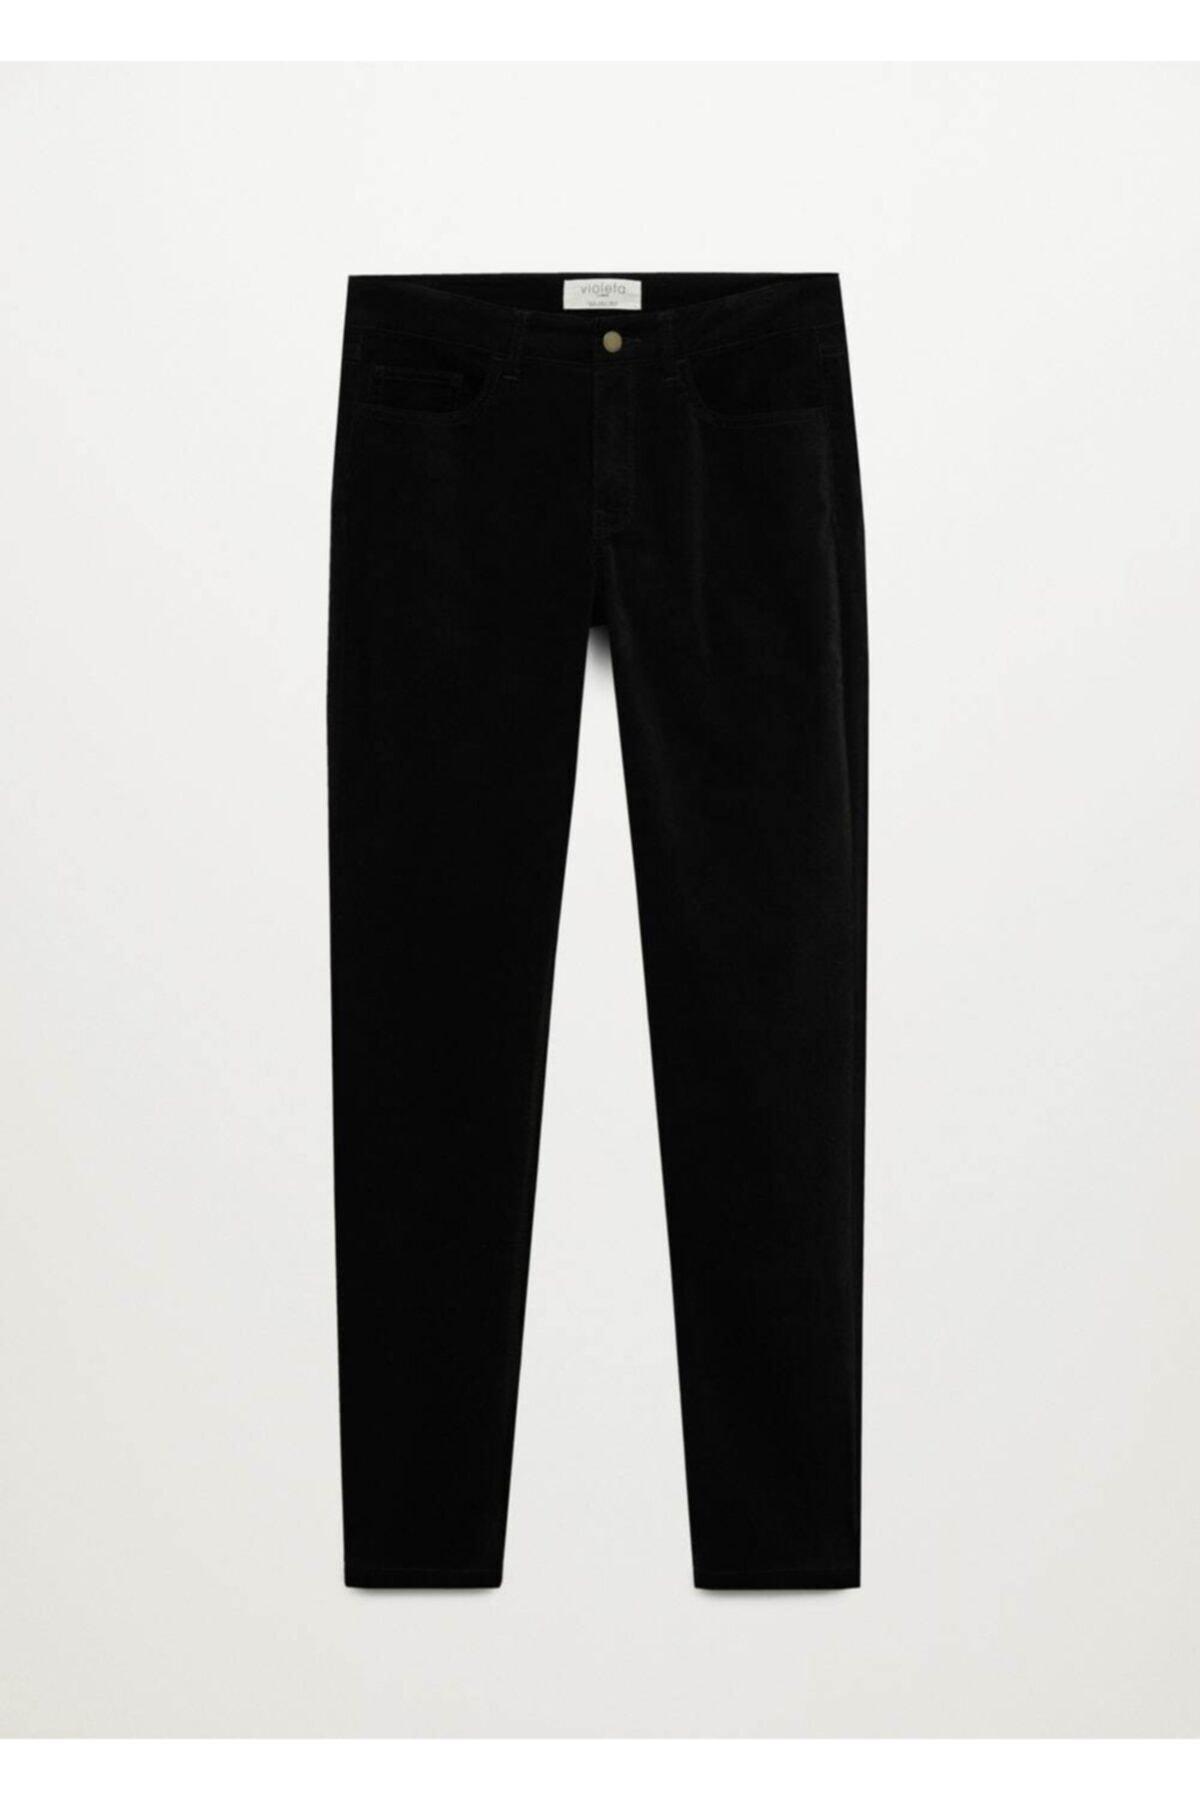 Violeta by MANGO Kadın Siyah Pantolon 1